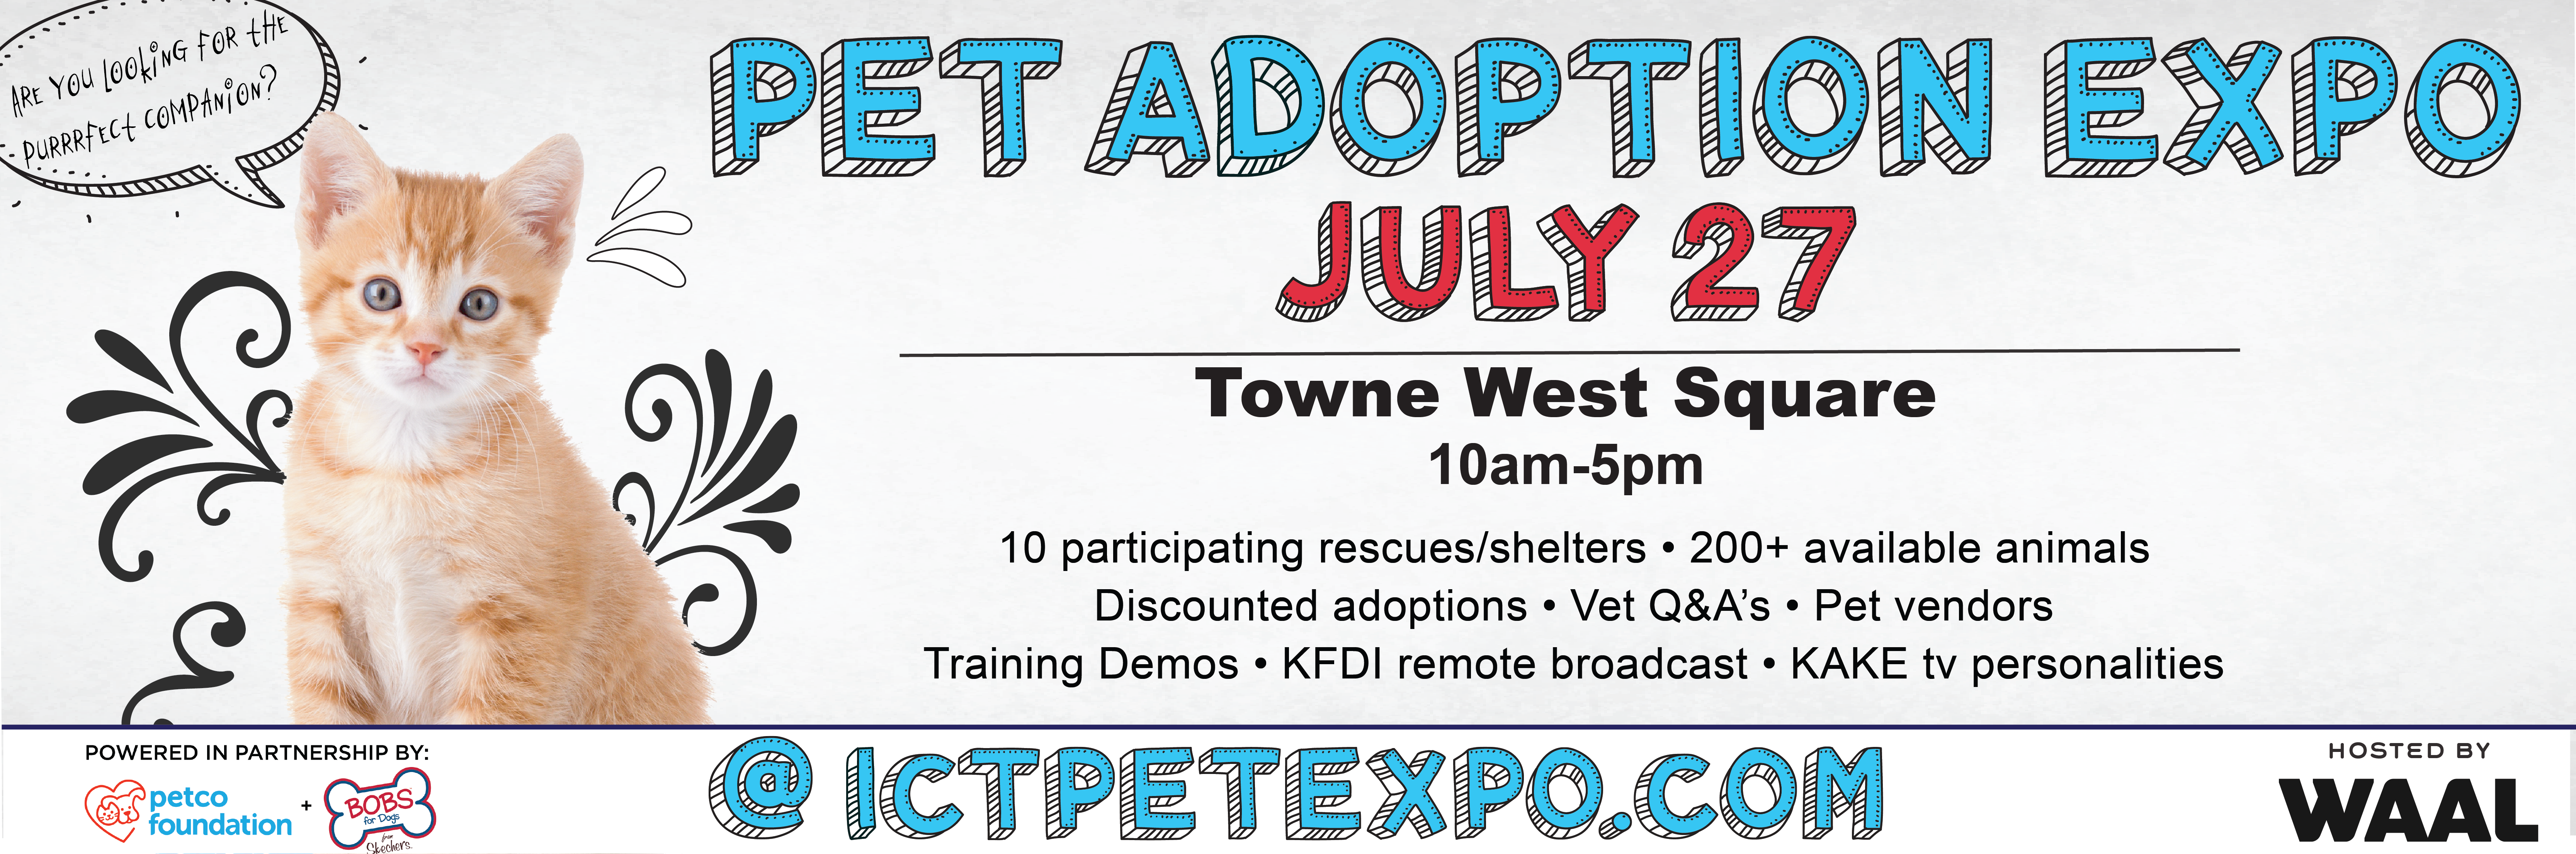 Wichita Animal Action League   Wichita Animal Rescue   Wichita, KS